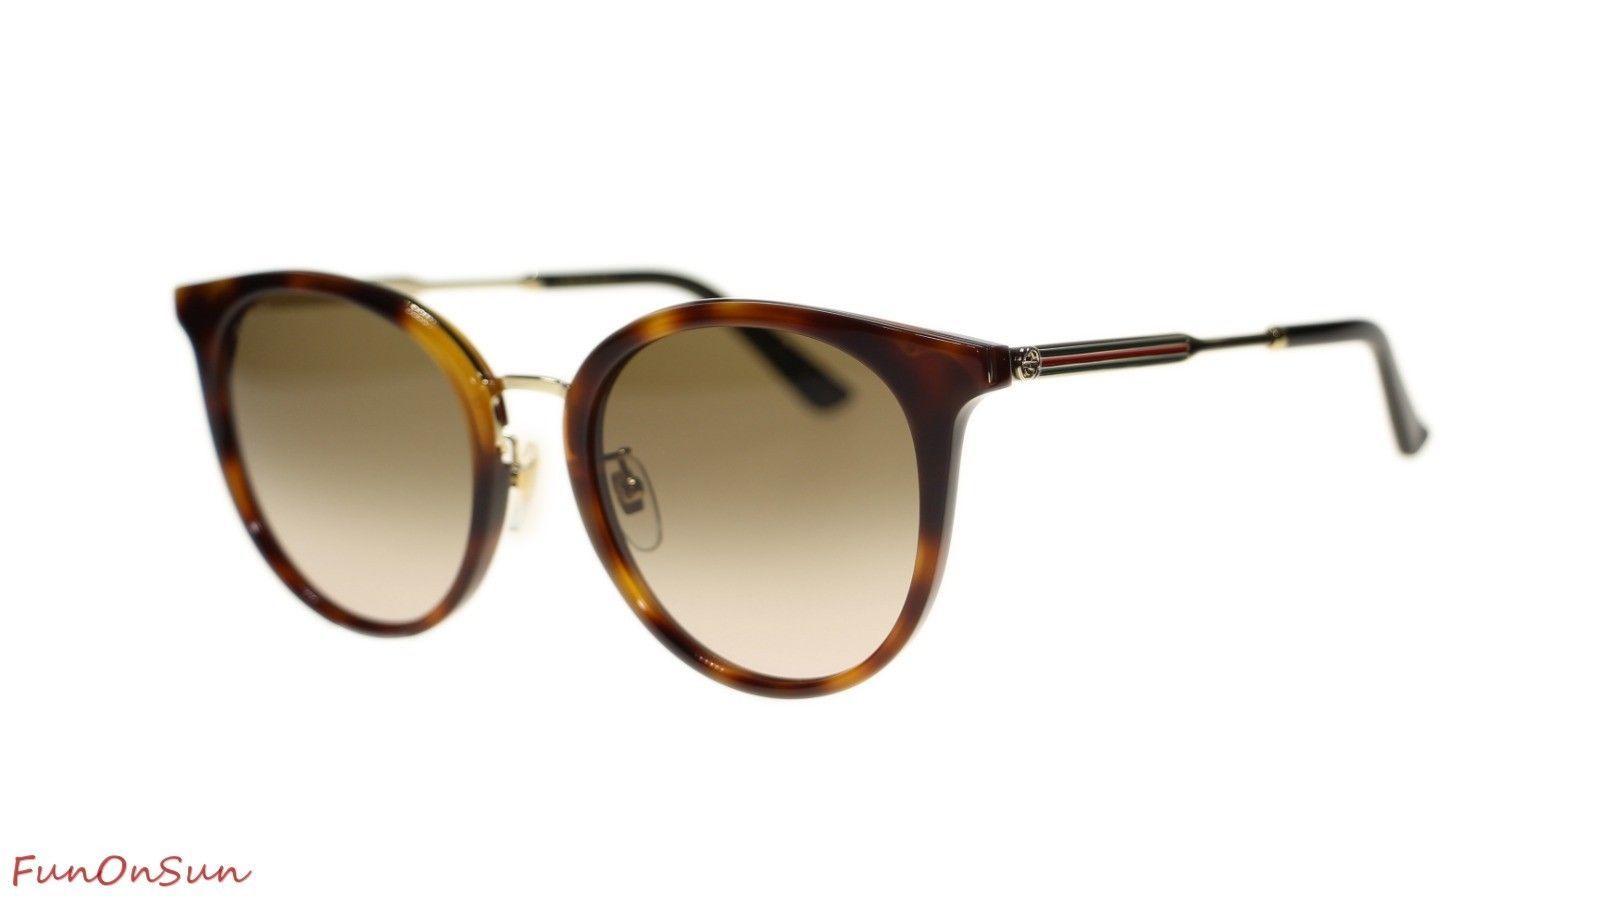 24a80659b8 Gucci Women Sunglasses GG0204S 003 Havana Brown Lens 56mm Authentic